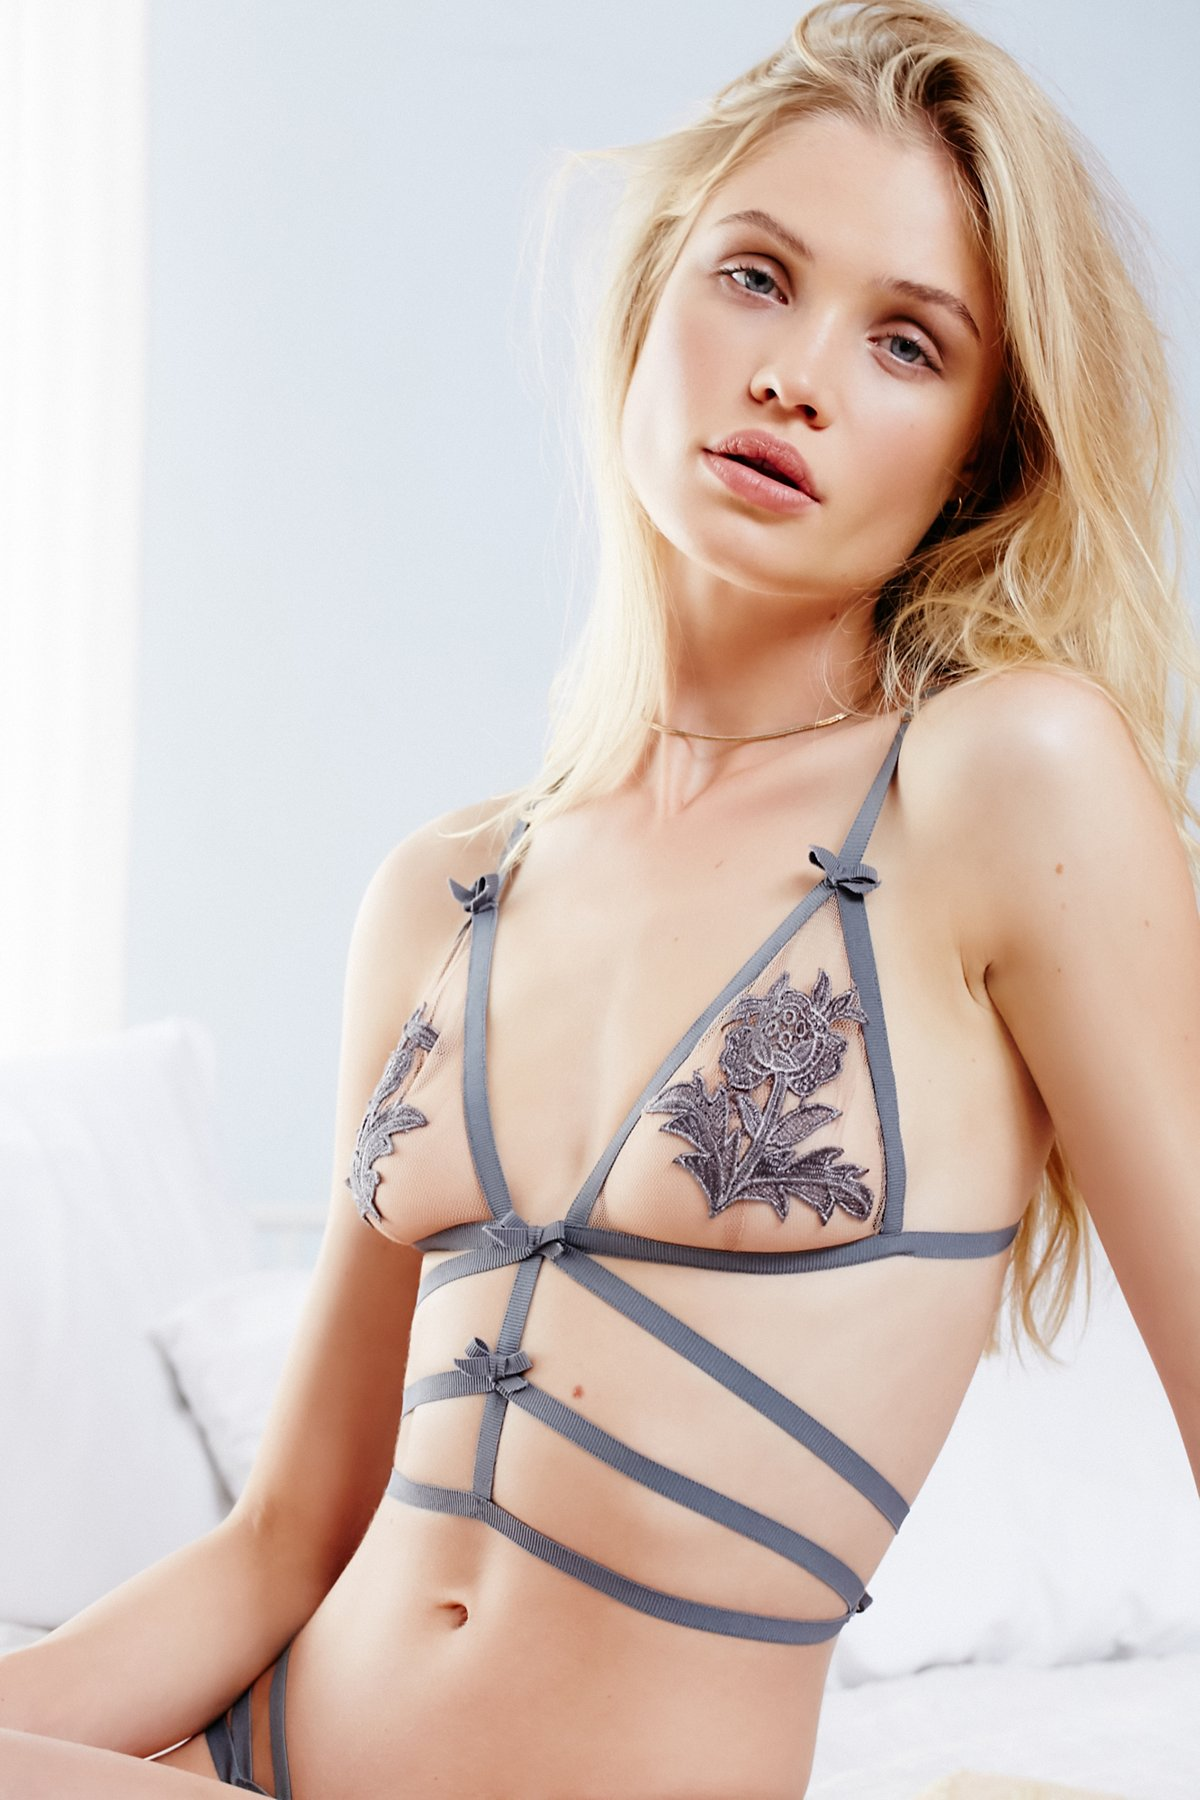 Nikki Bralette